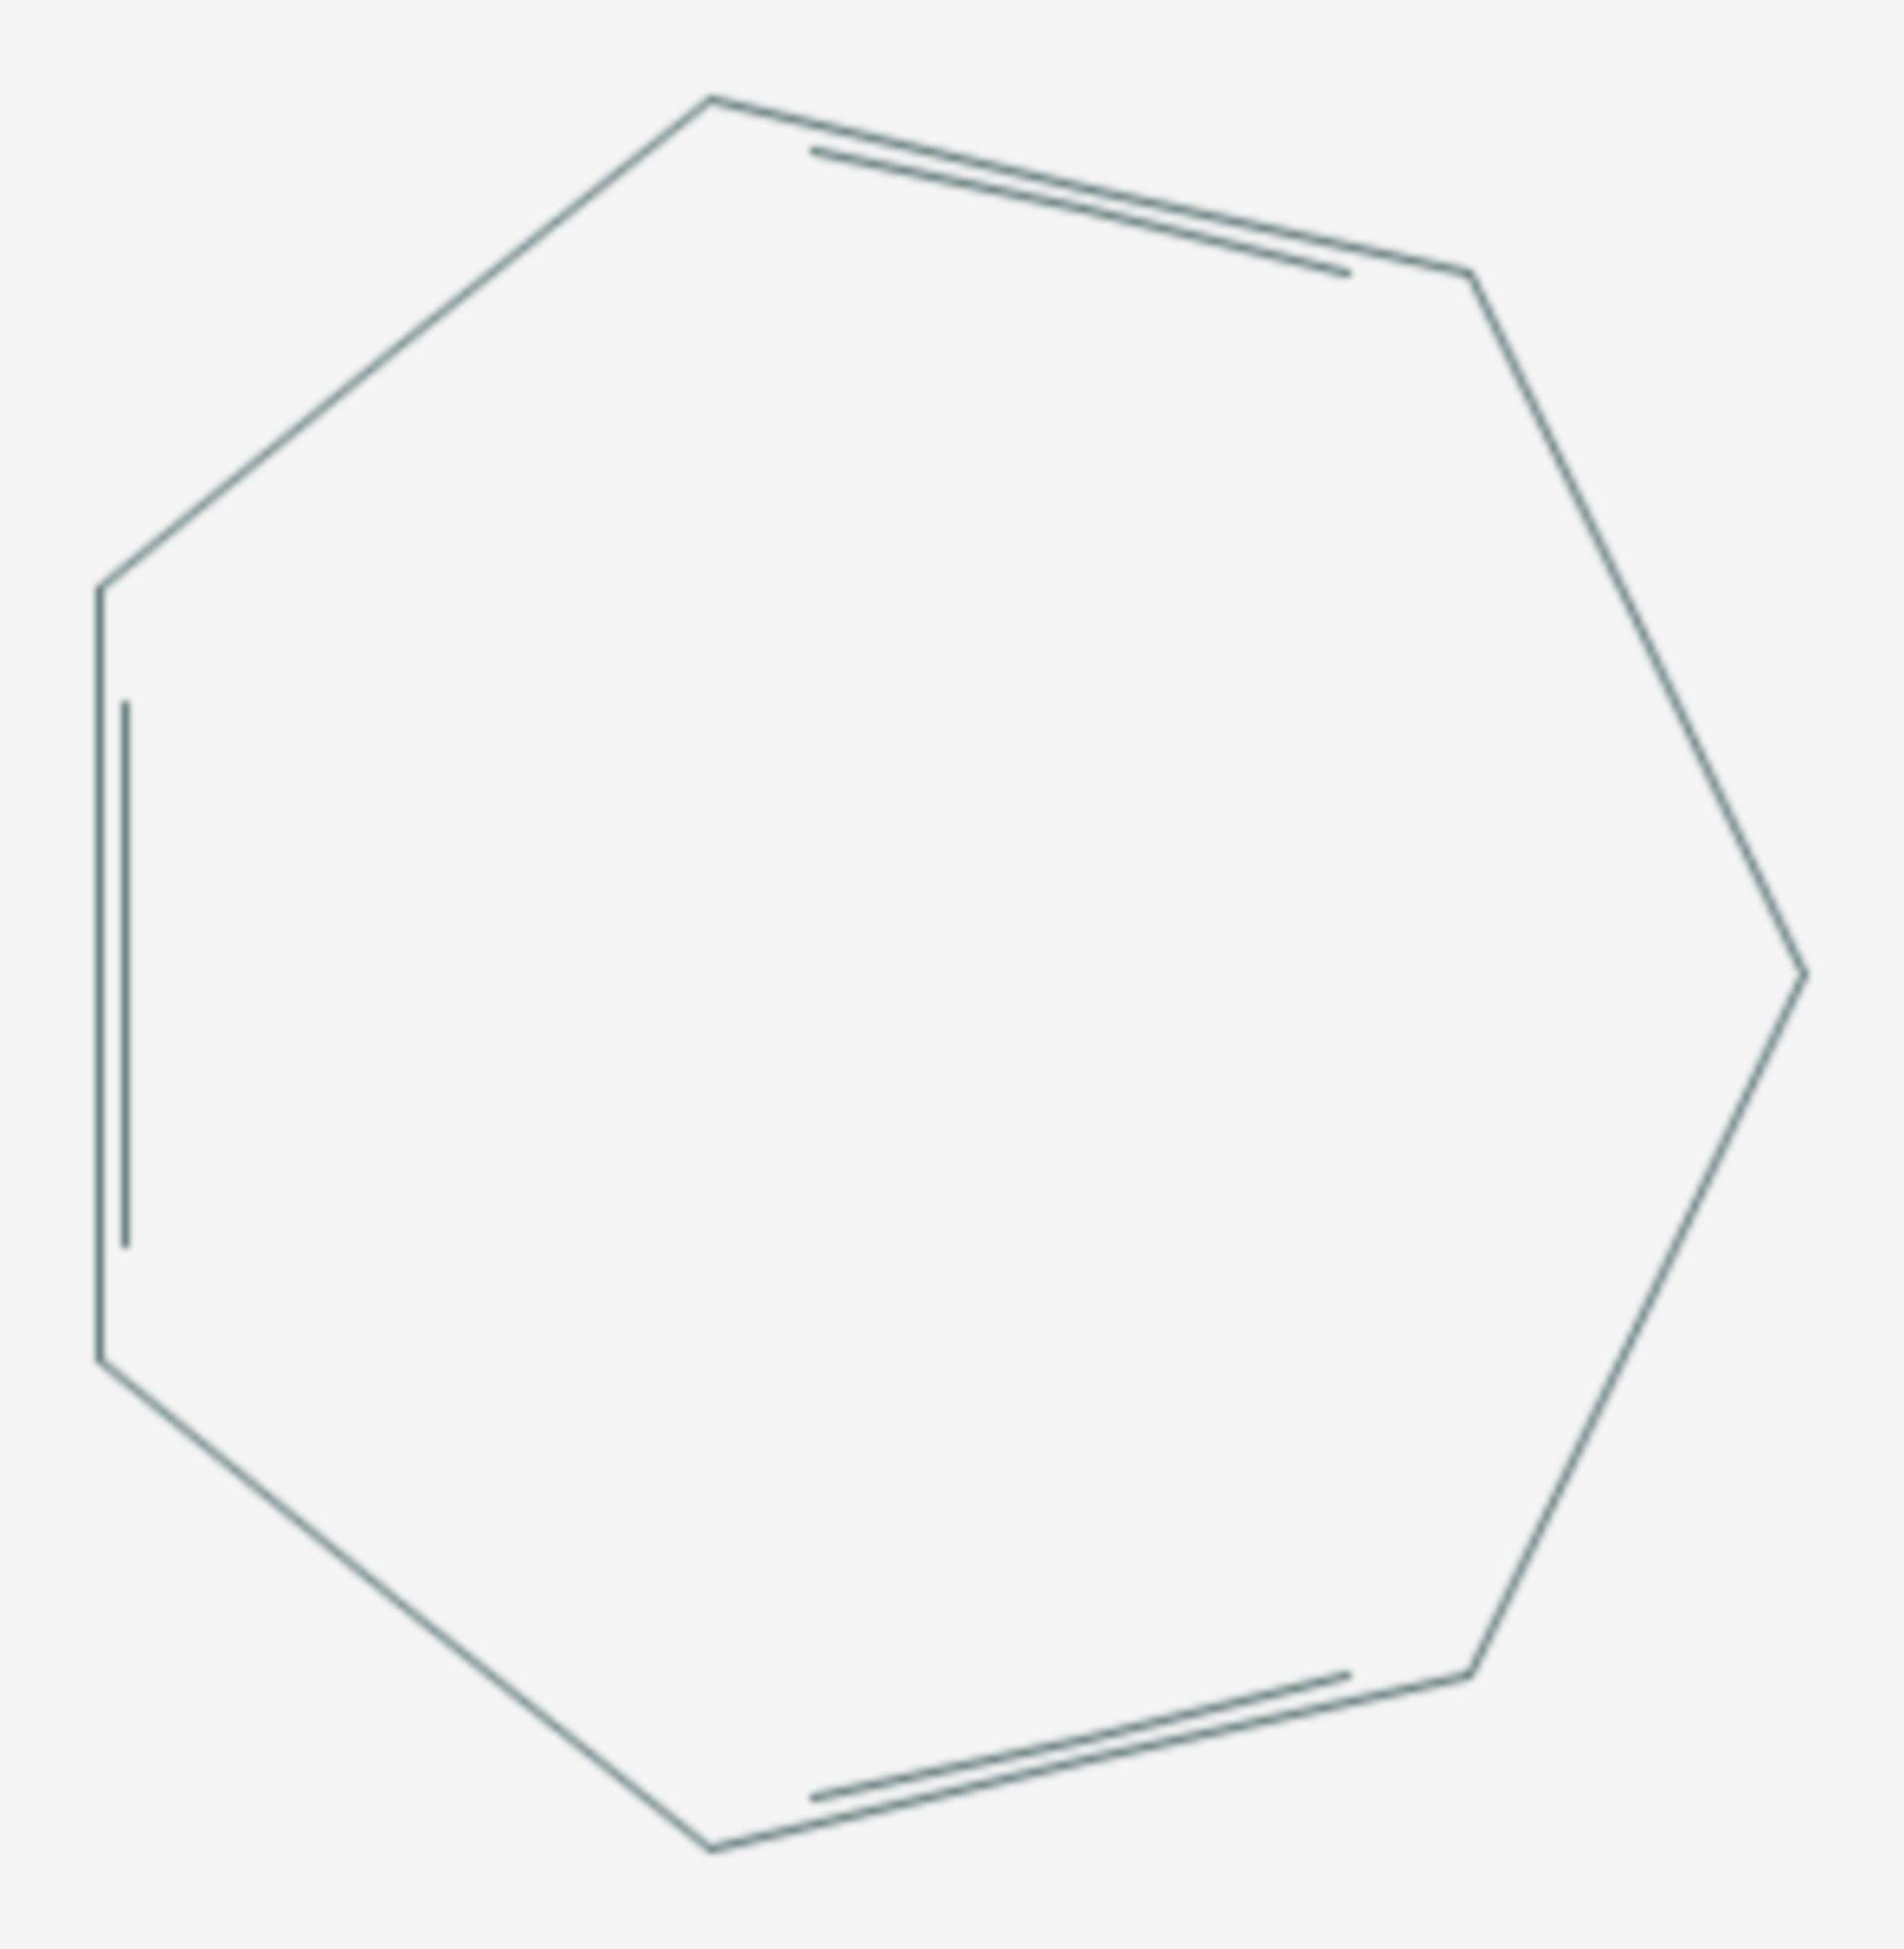 Cycloheptatrien (Strukturformel)